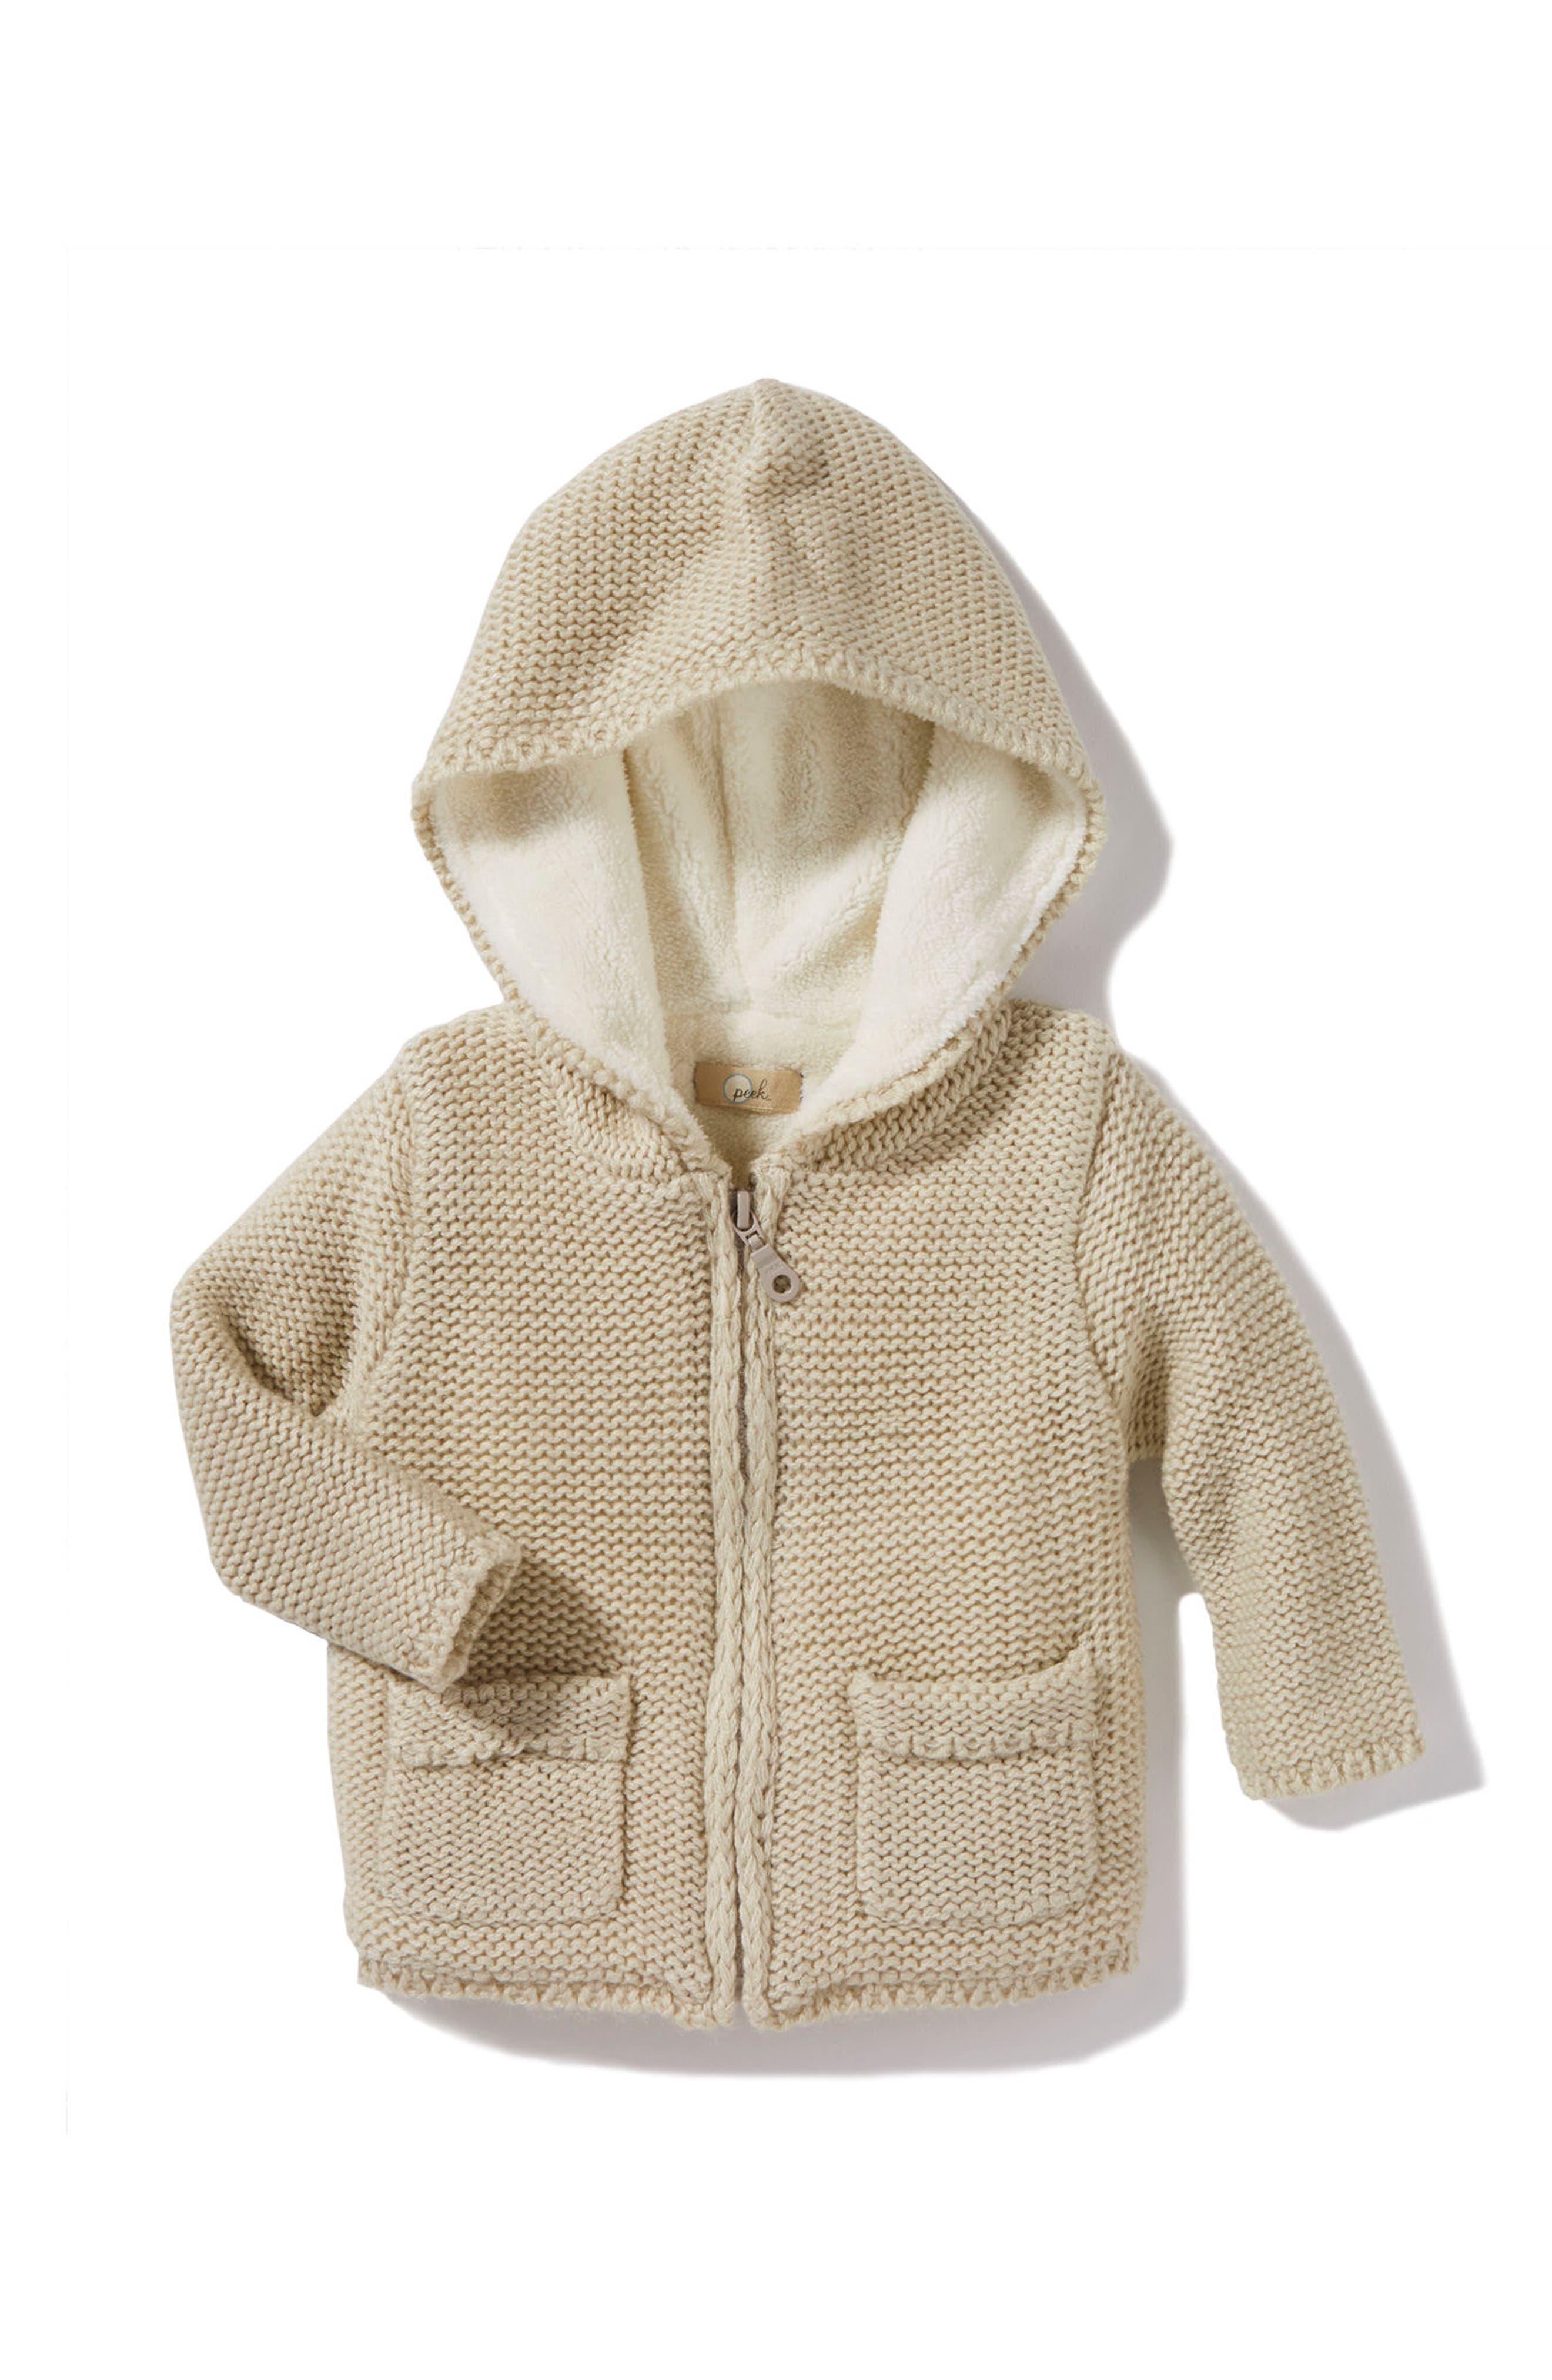 Peek Skyler Hooded Sweater,                             Main thumbnail 1, color,                             272